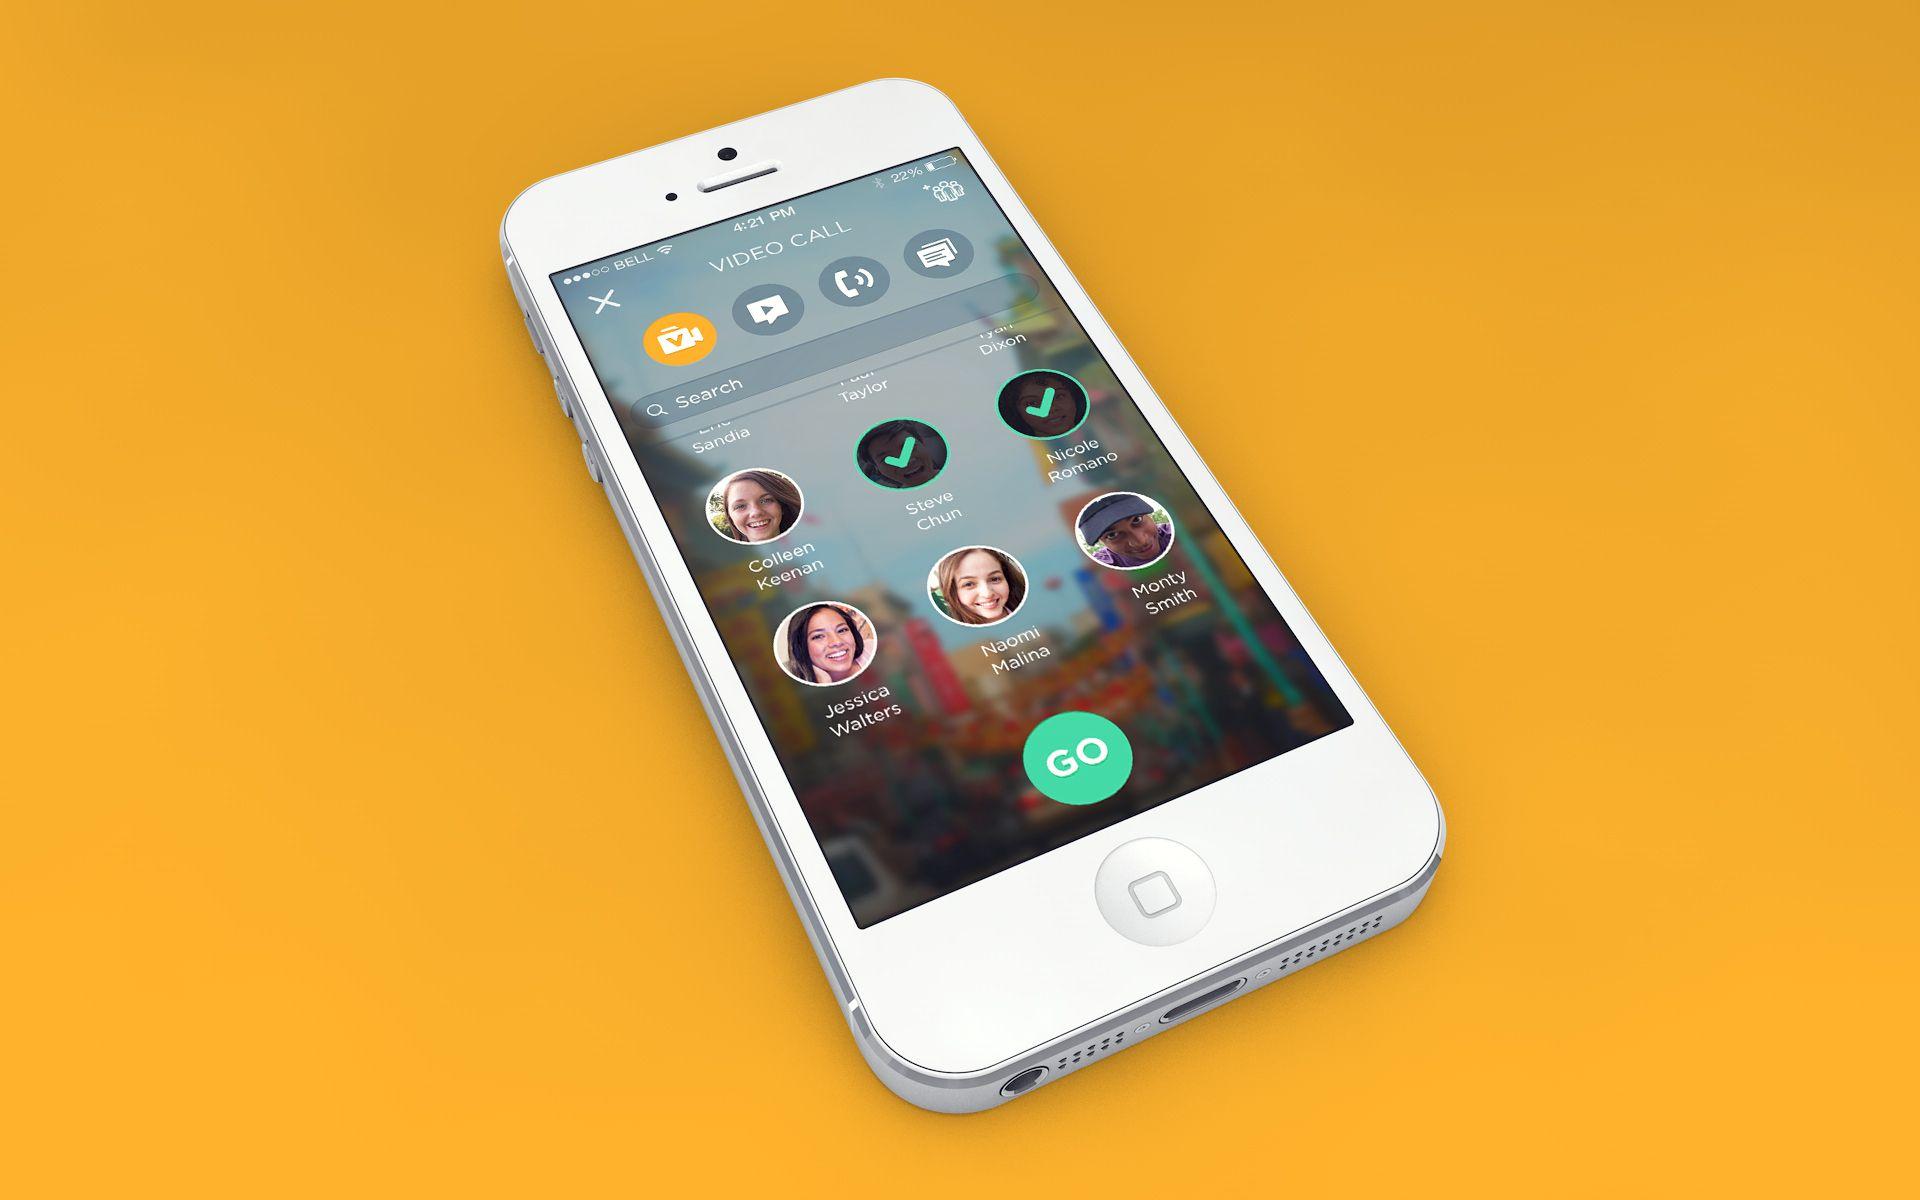 Iphone_build_call iphone samsung galaxy phone galaxy phone